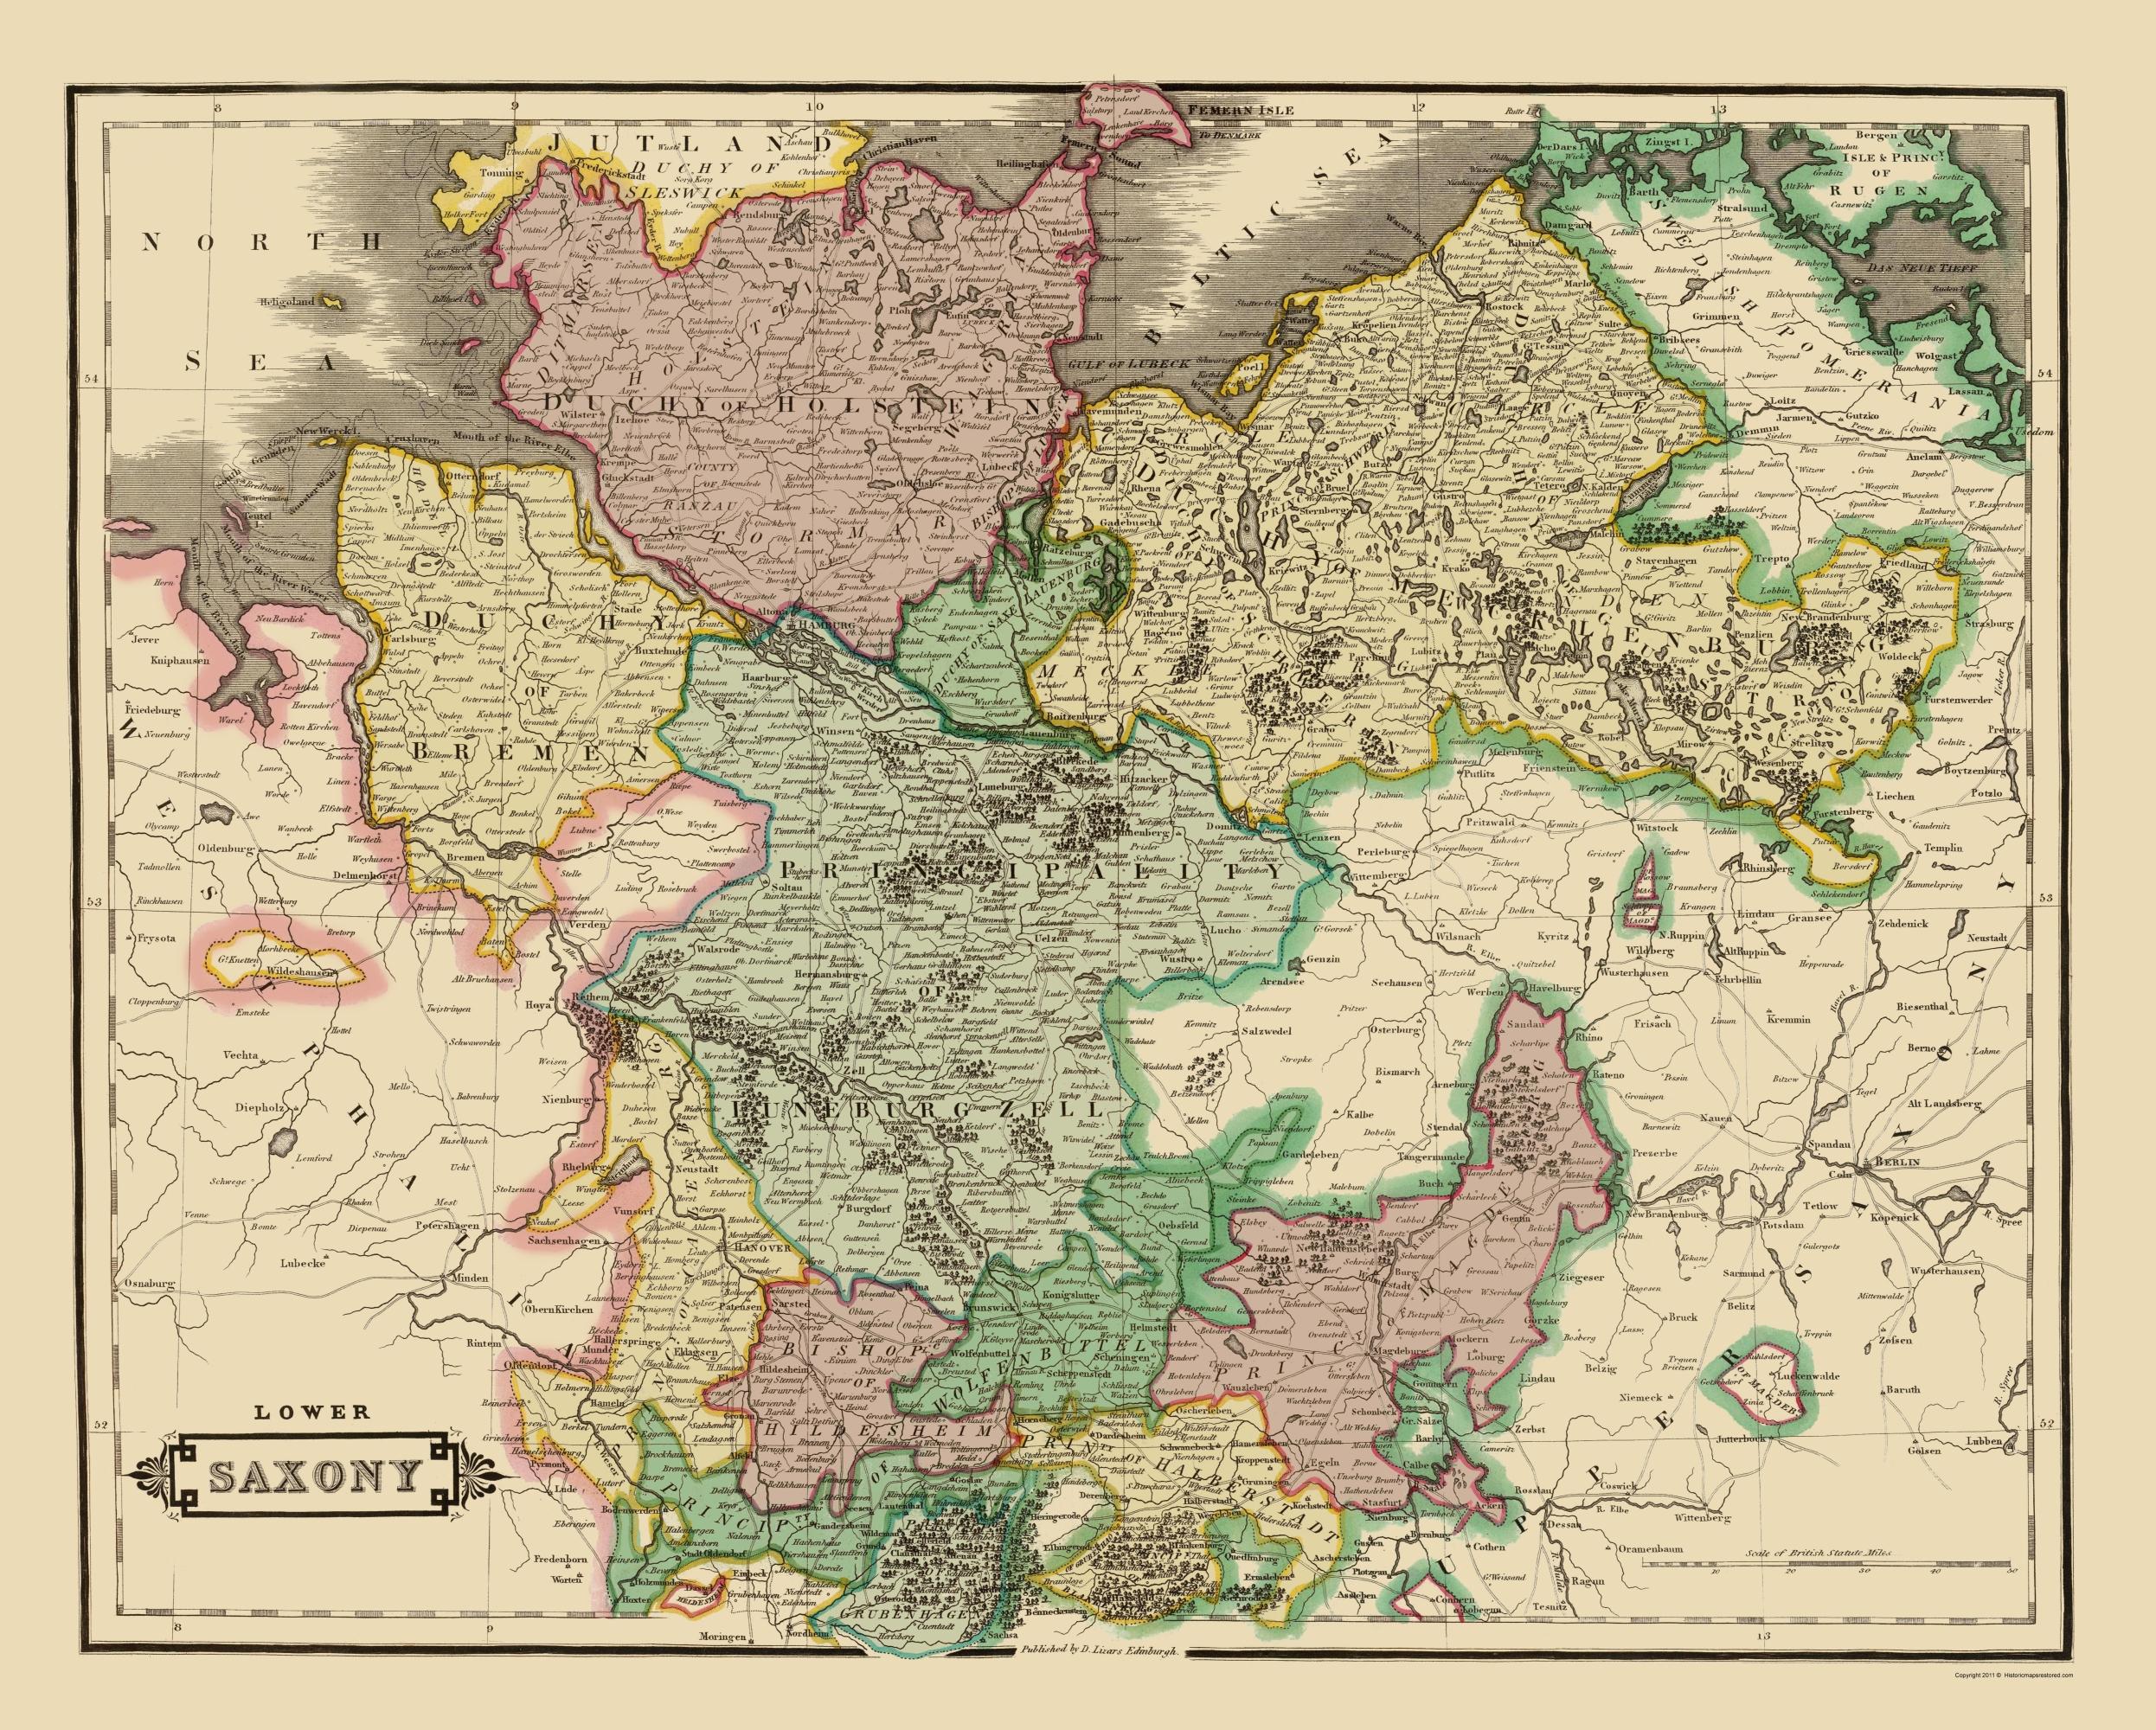 Lower Saxony Germany Map.Old Germany Map Lower Saxony Hamilton 1831